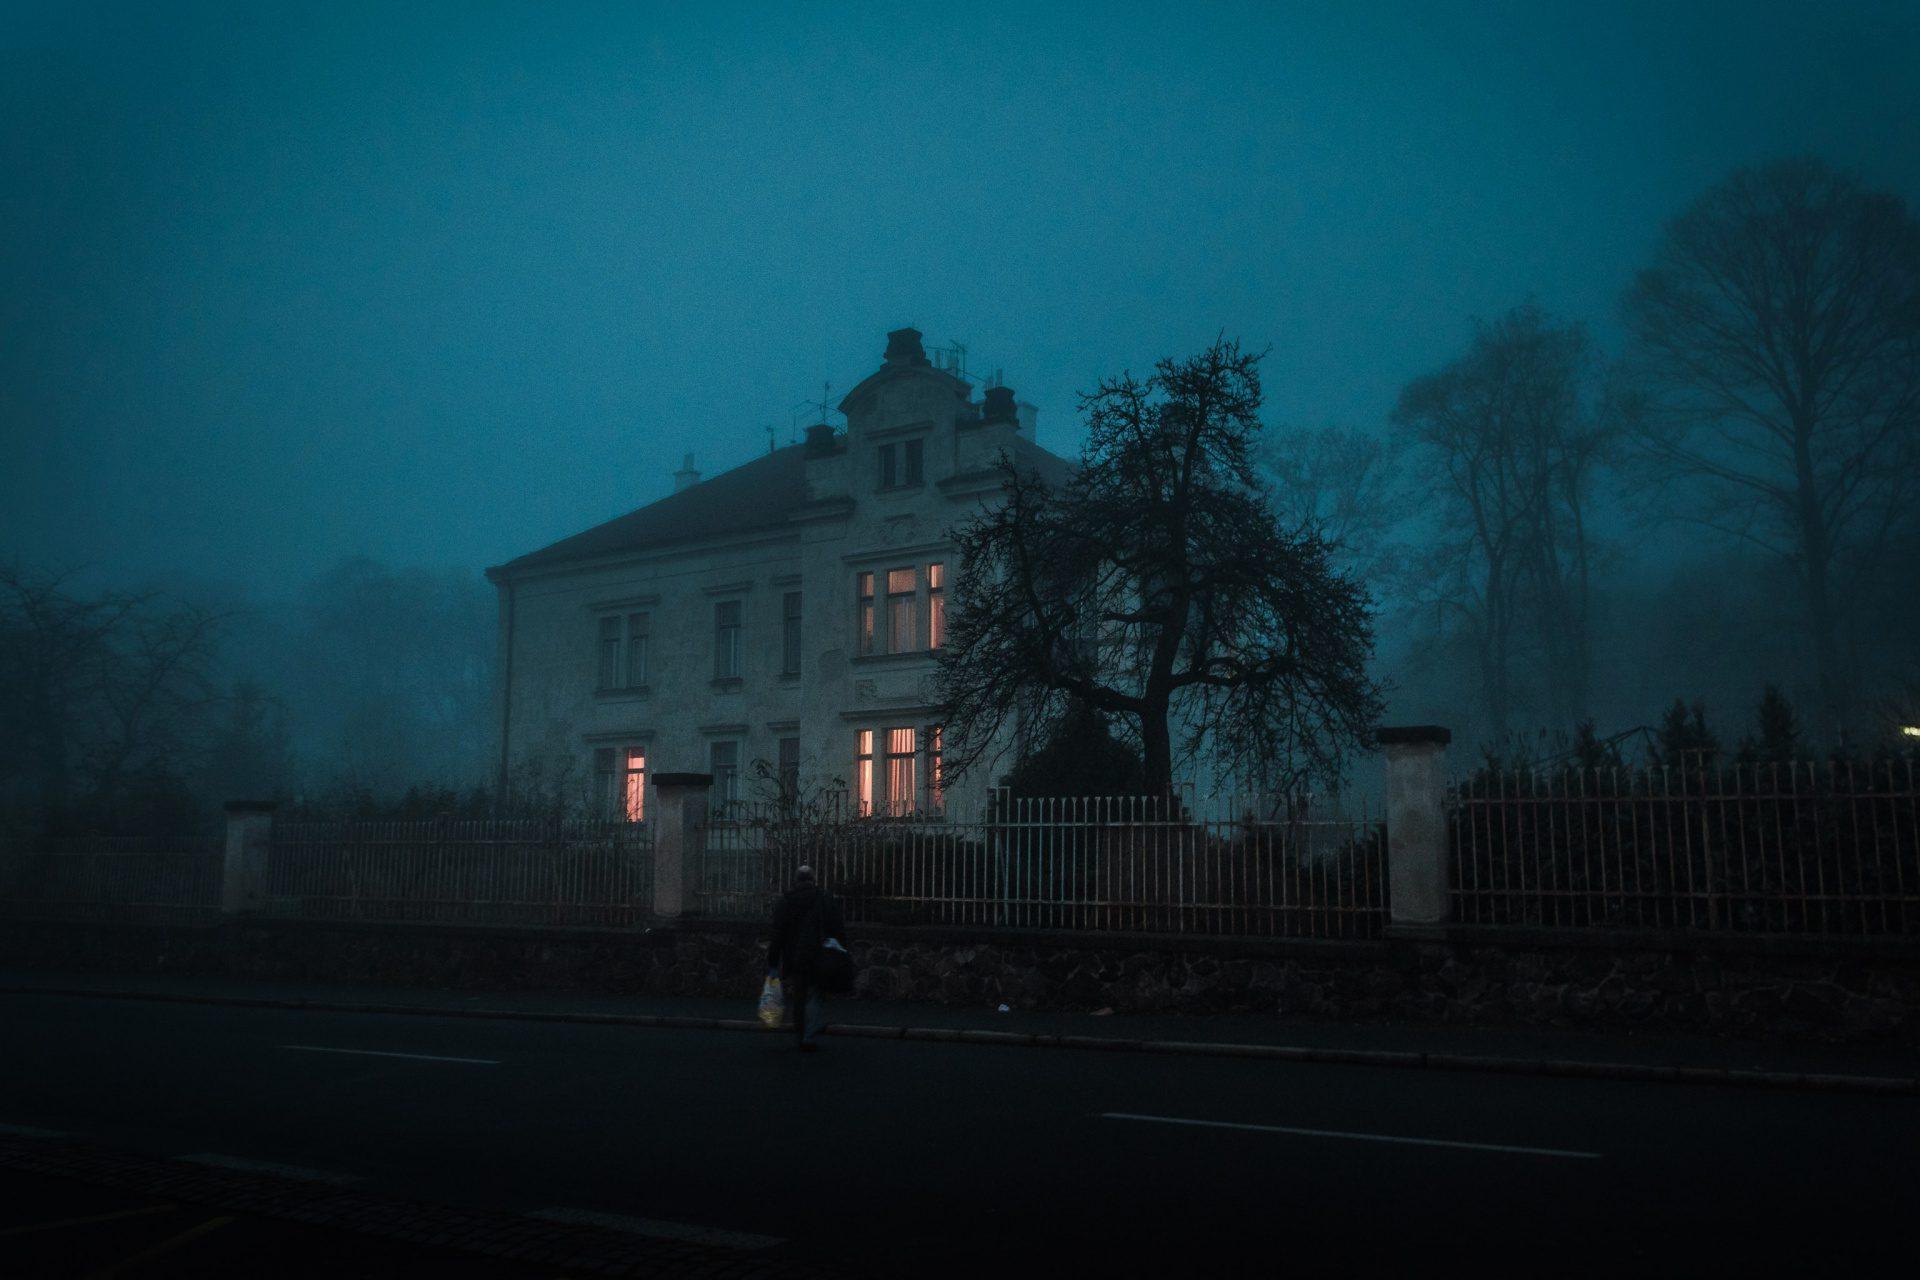 Cadilar Bayraminda Turkiye Icin 22 Gercek Paranormal Korkunc Olay